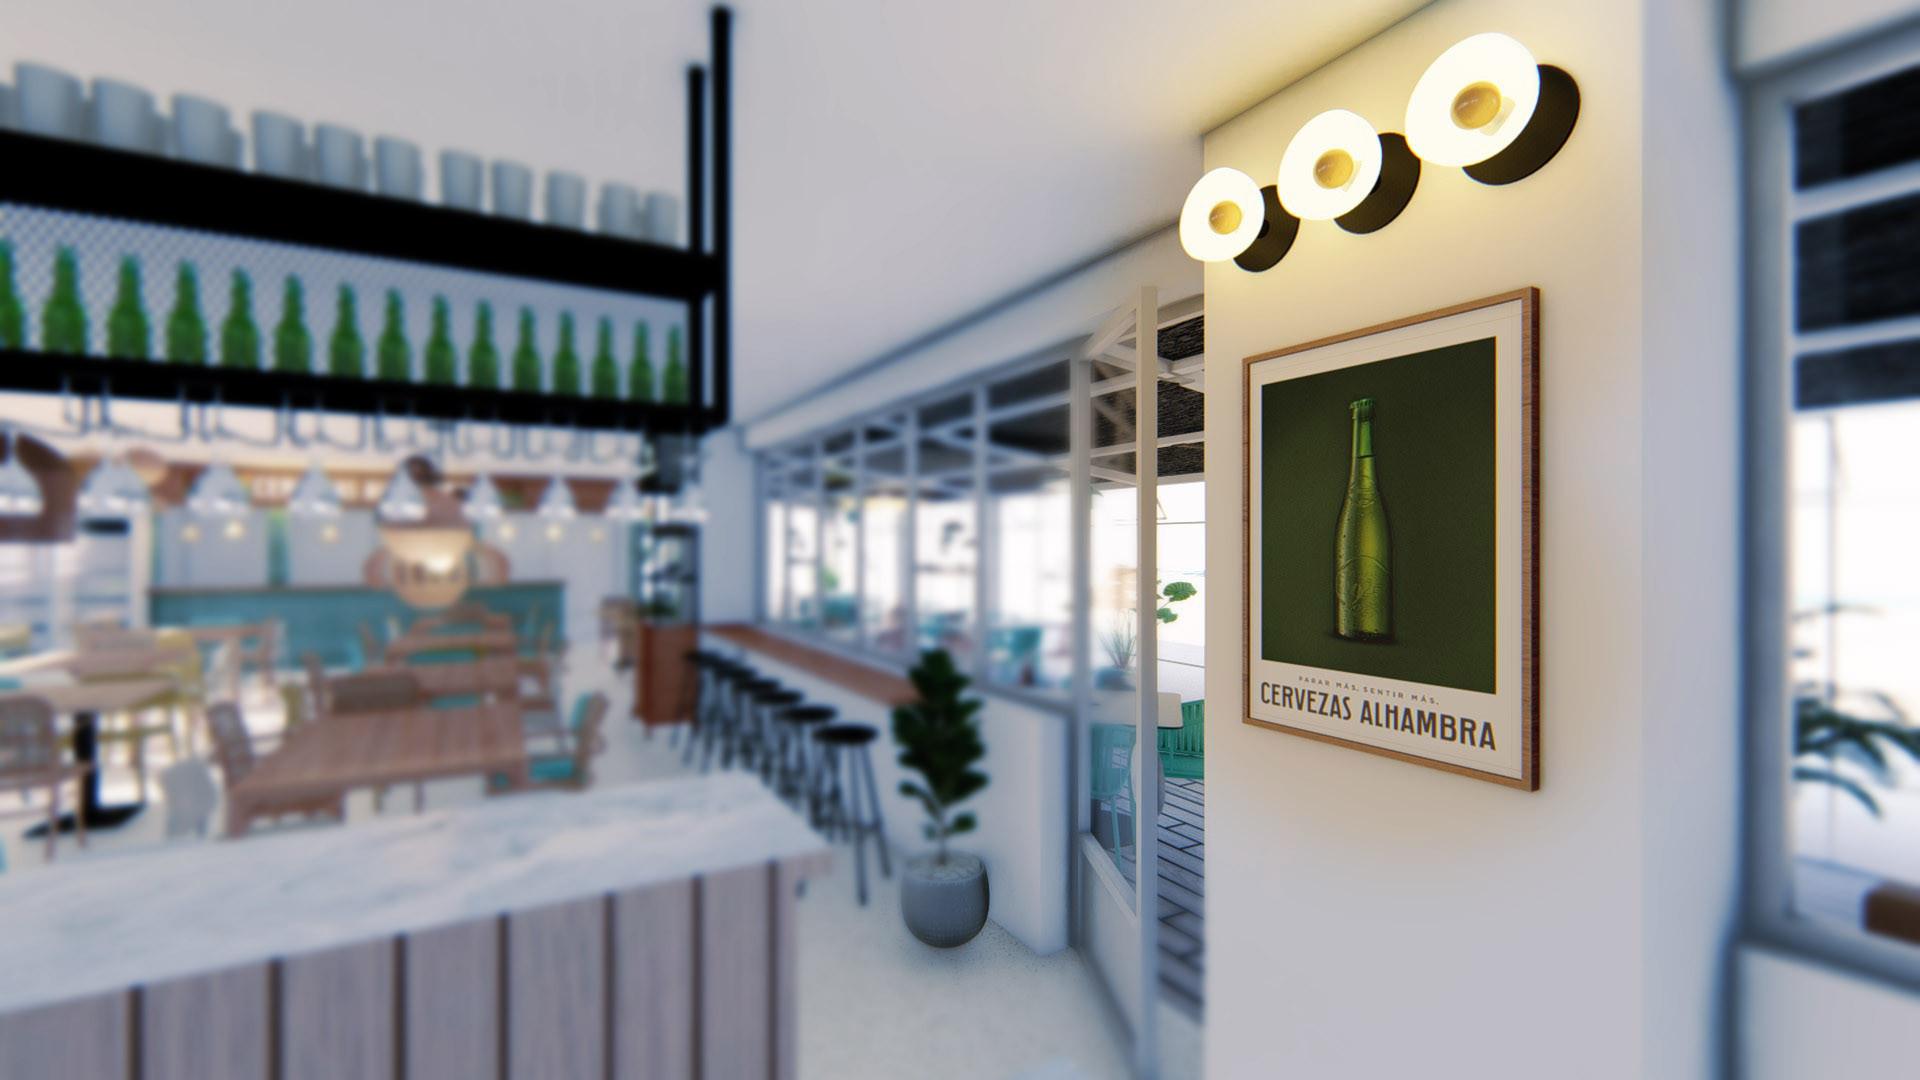 15.kauri diseño de interiores arquitectura interiorismo interior Málaga